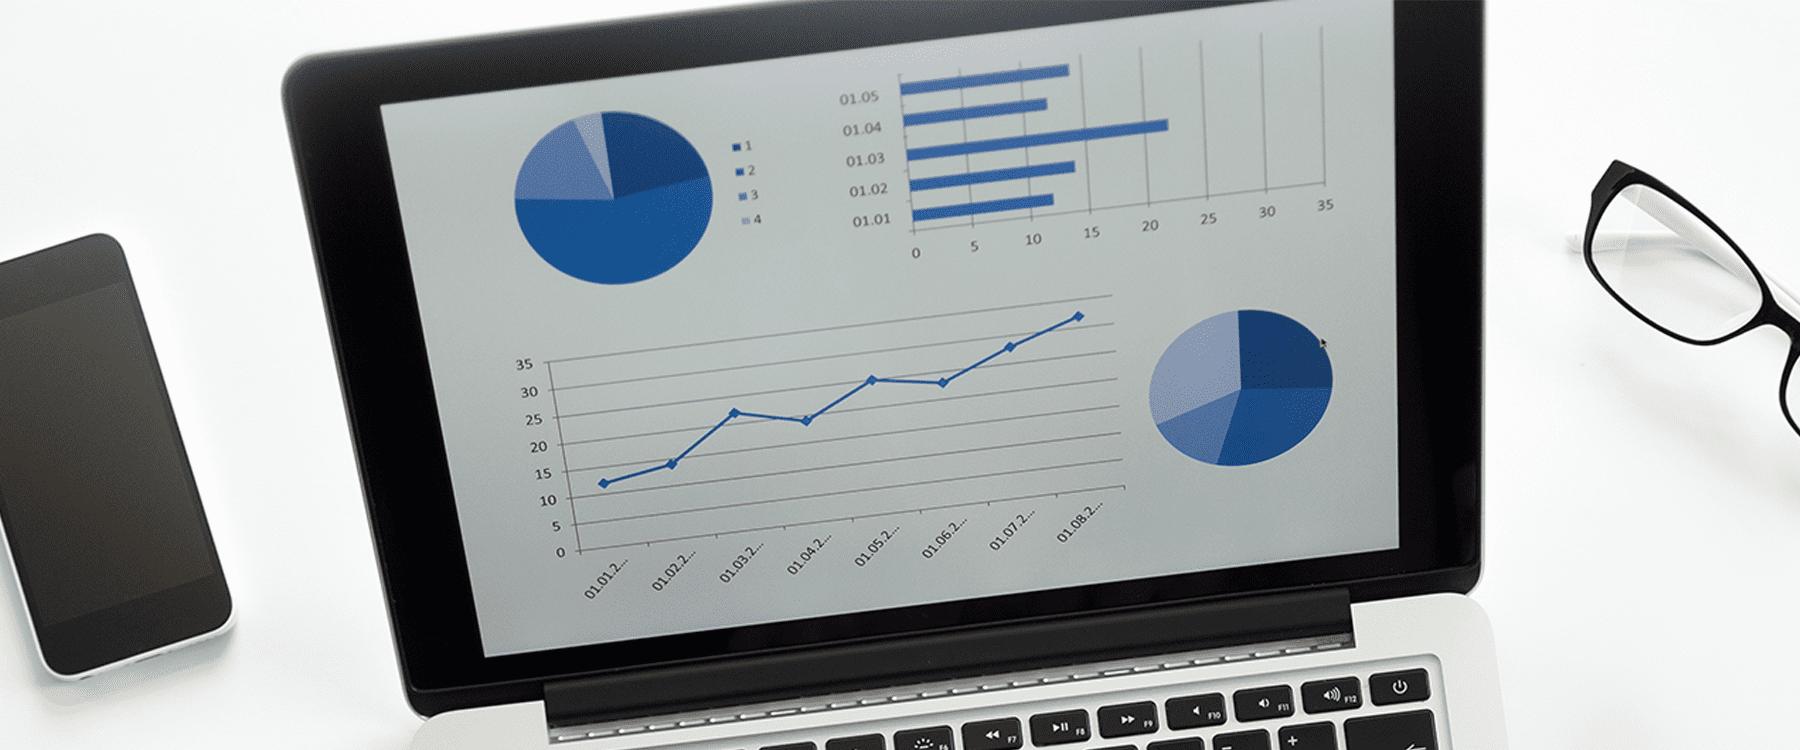 Using Google Analytics to Improve your Website Image